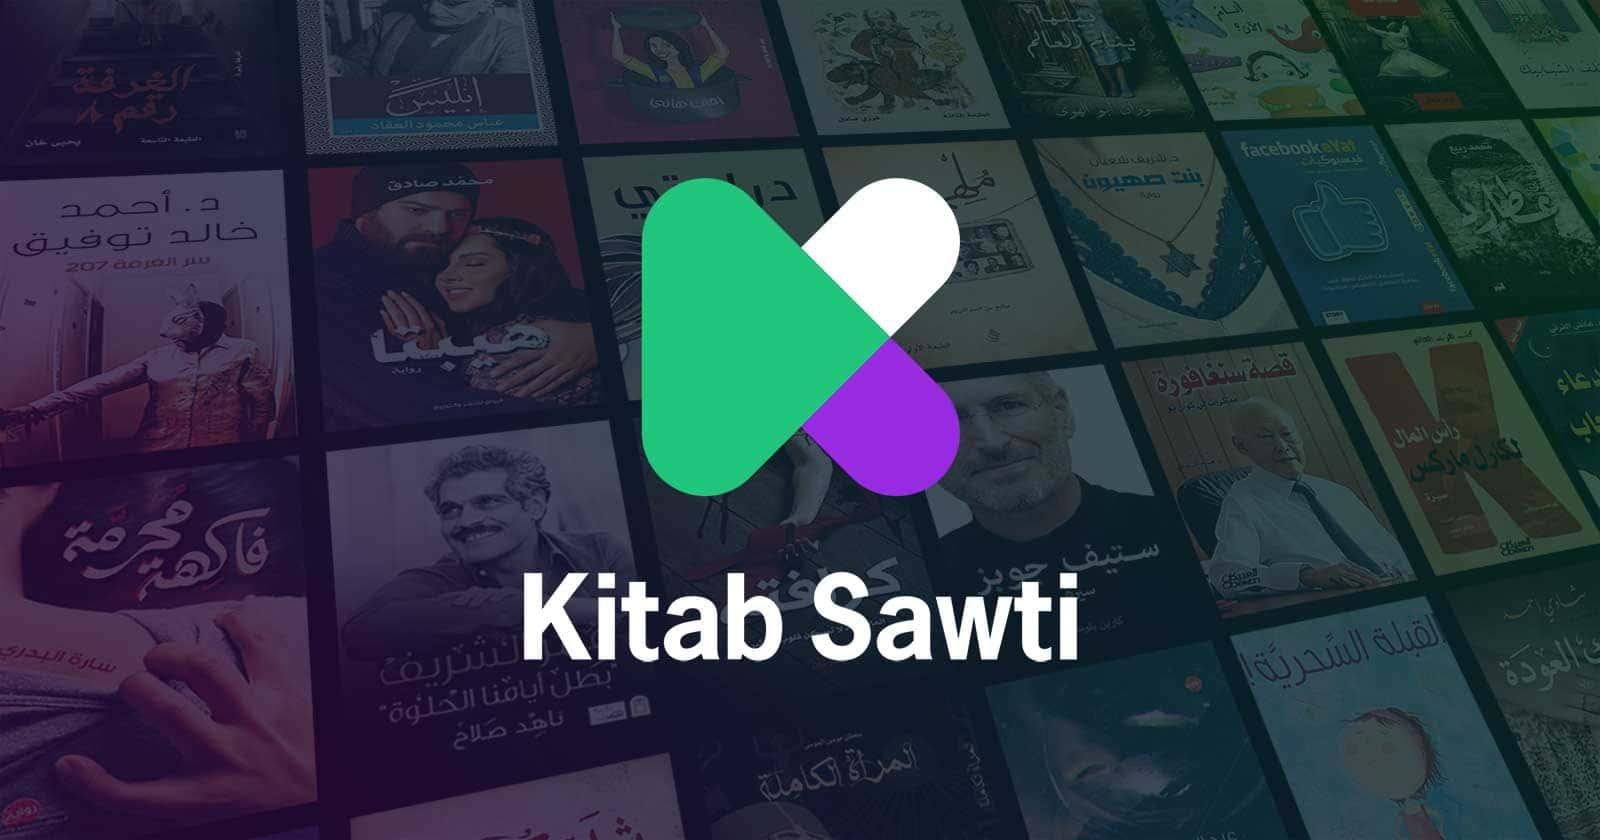 2- تطبيق Kitab Sawti